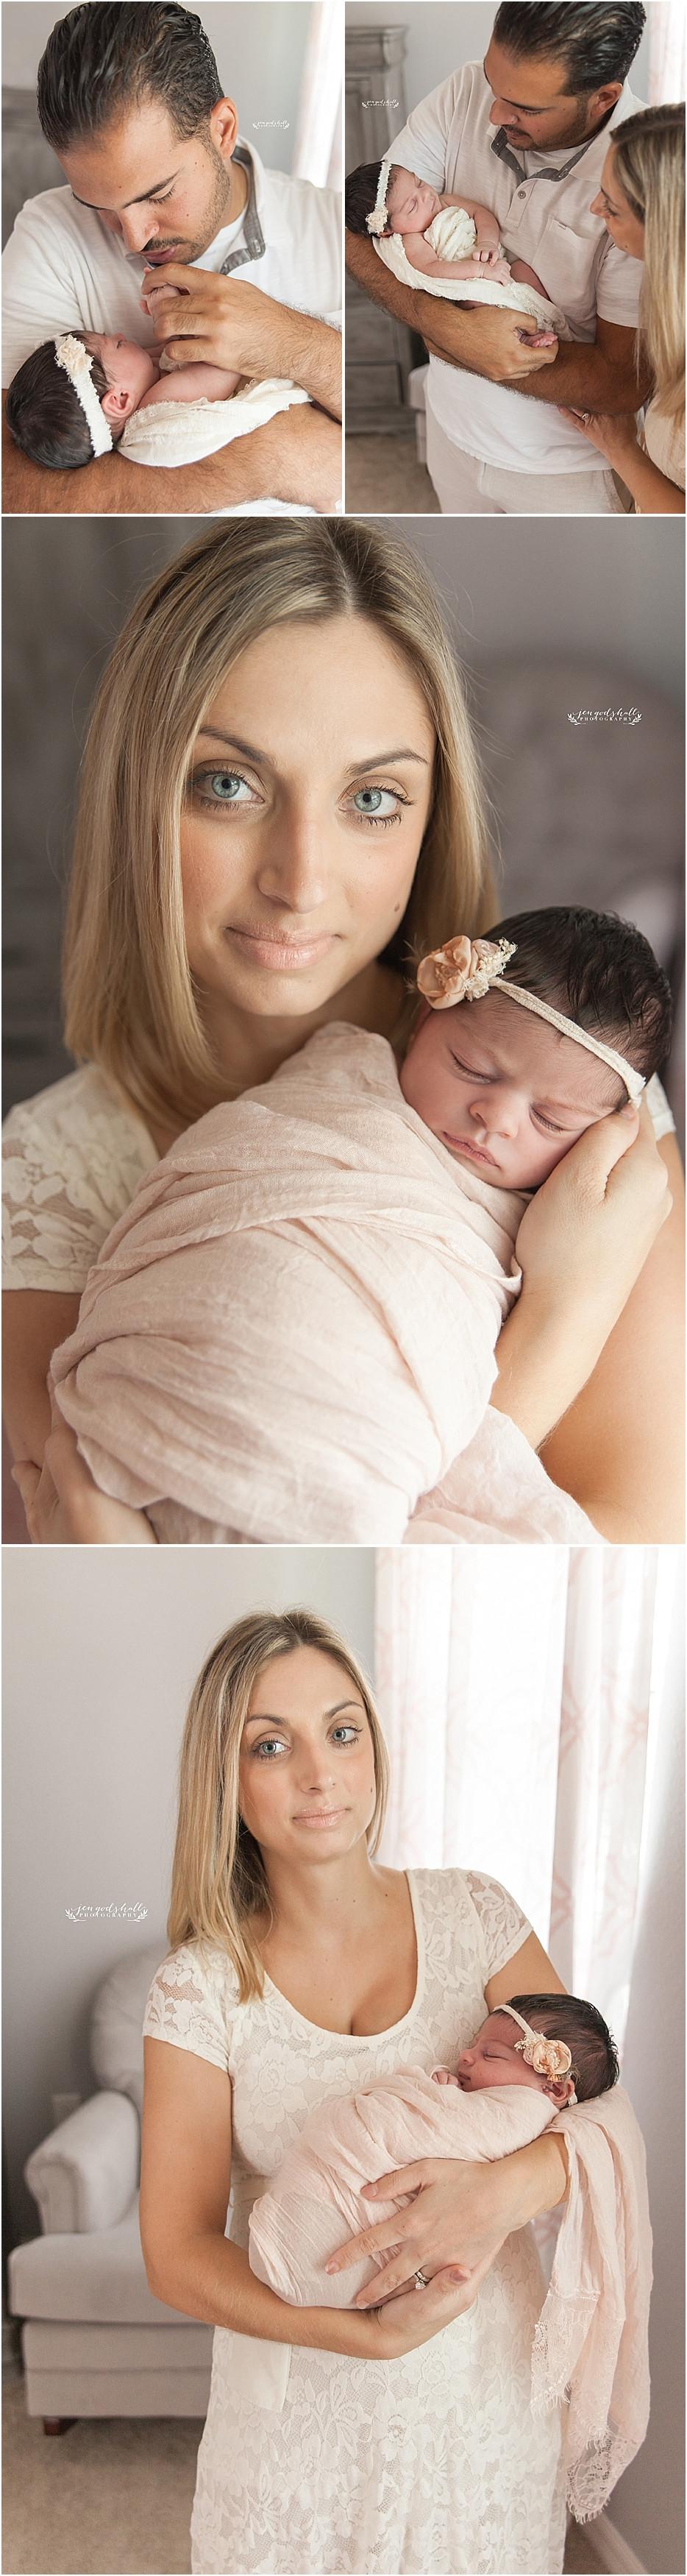 Sarasota Newborn Photographer Baby Photos Jen Godshall Portrait